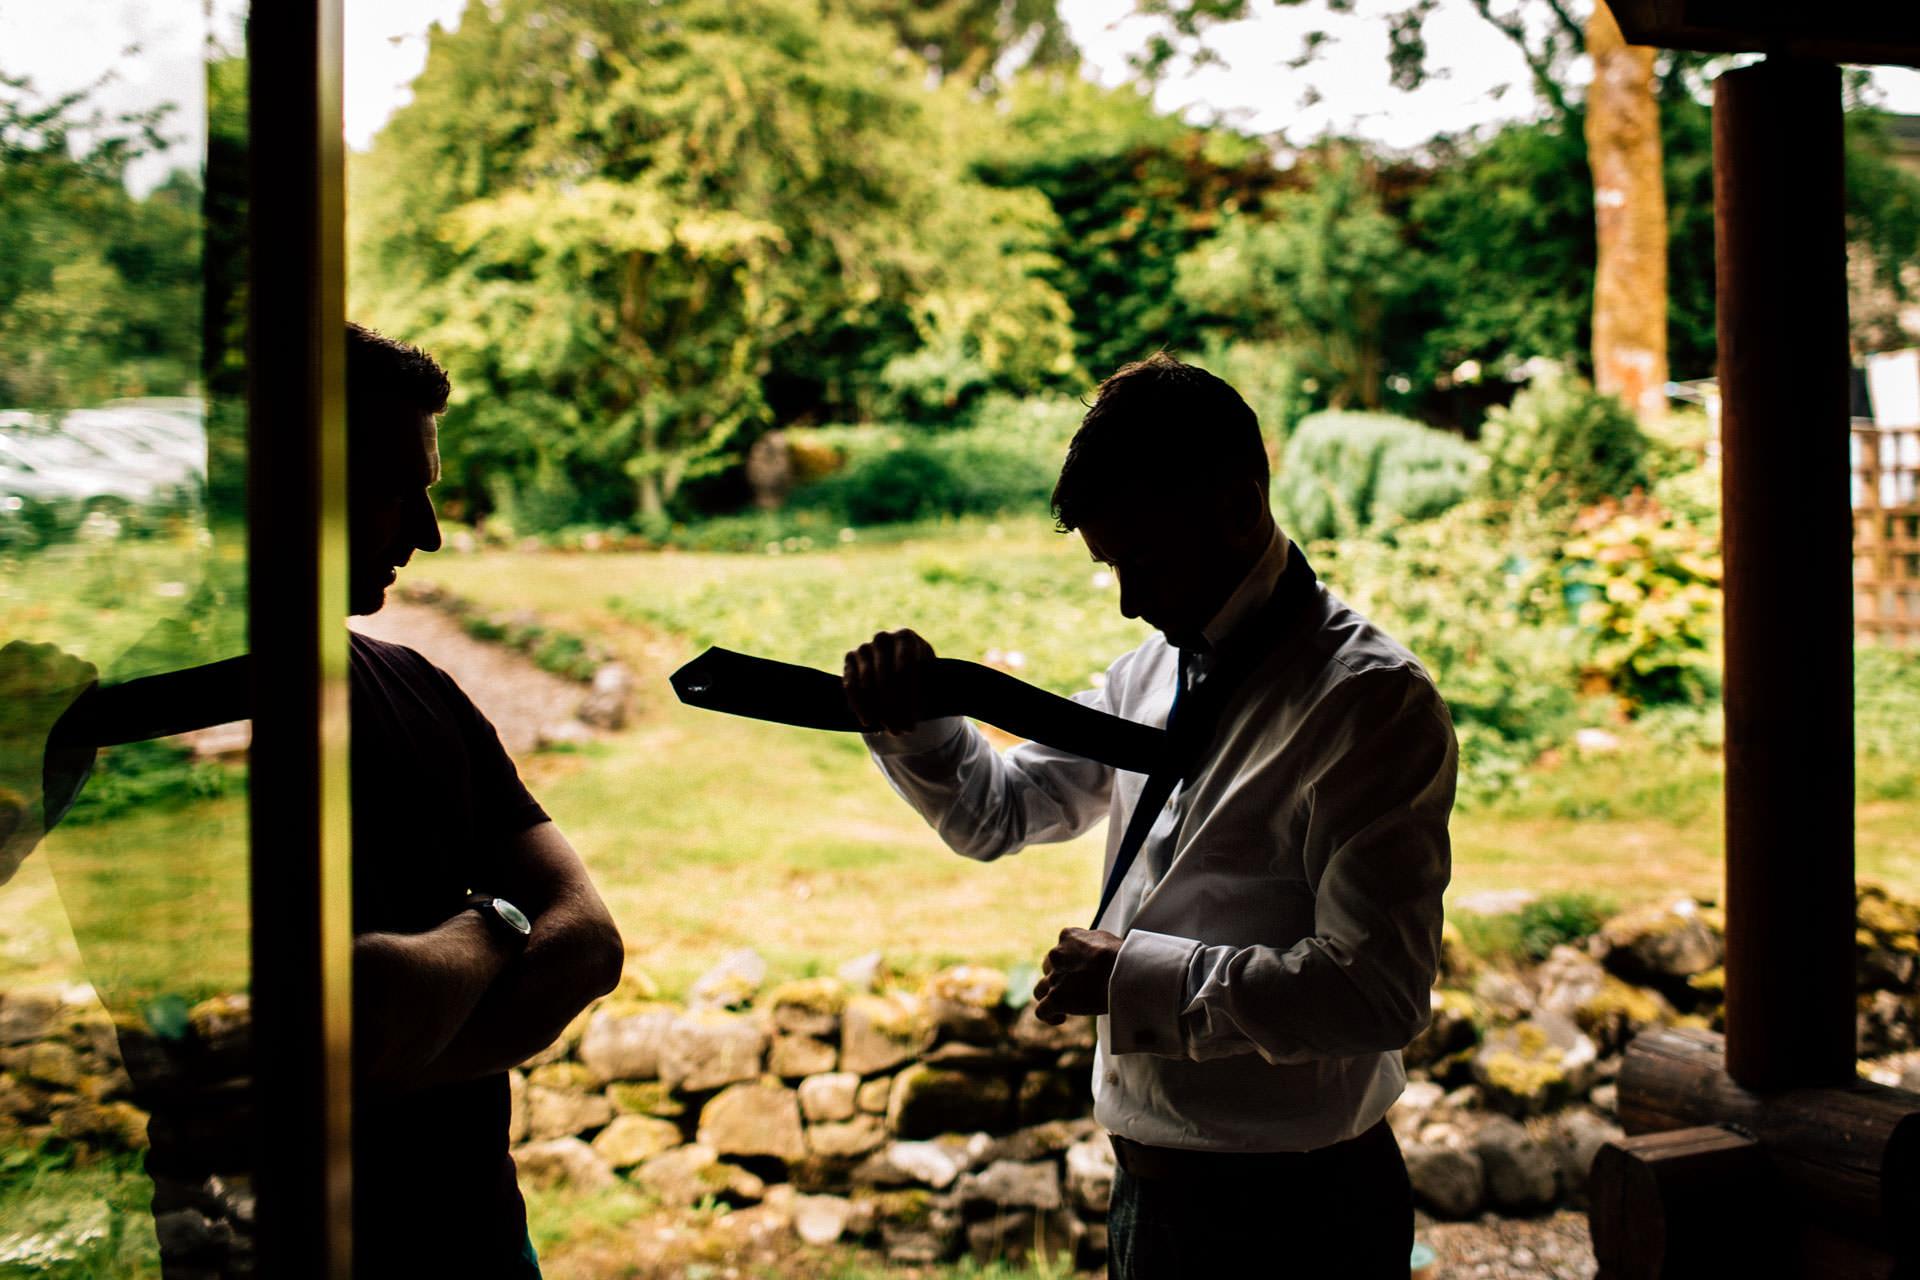 The Gamekeepers Inn Wedding Photography - A Fab Summer Wedding